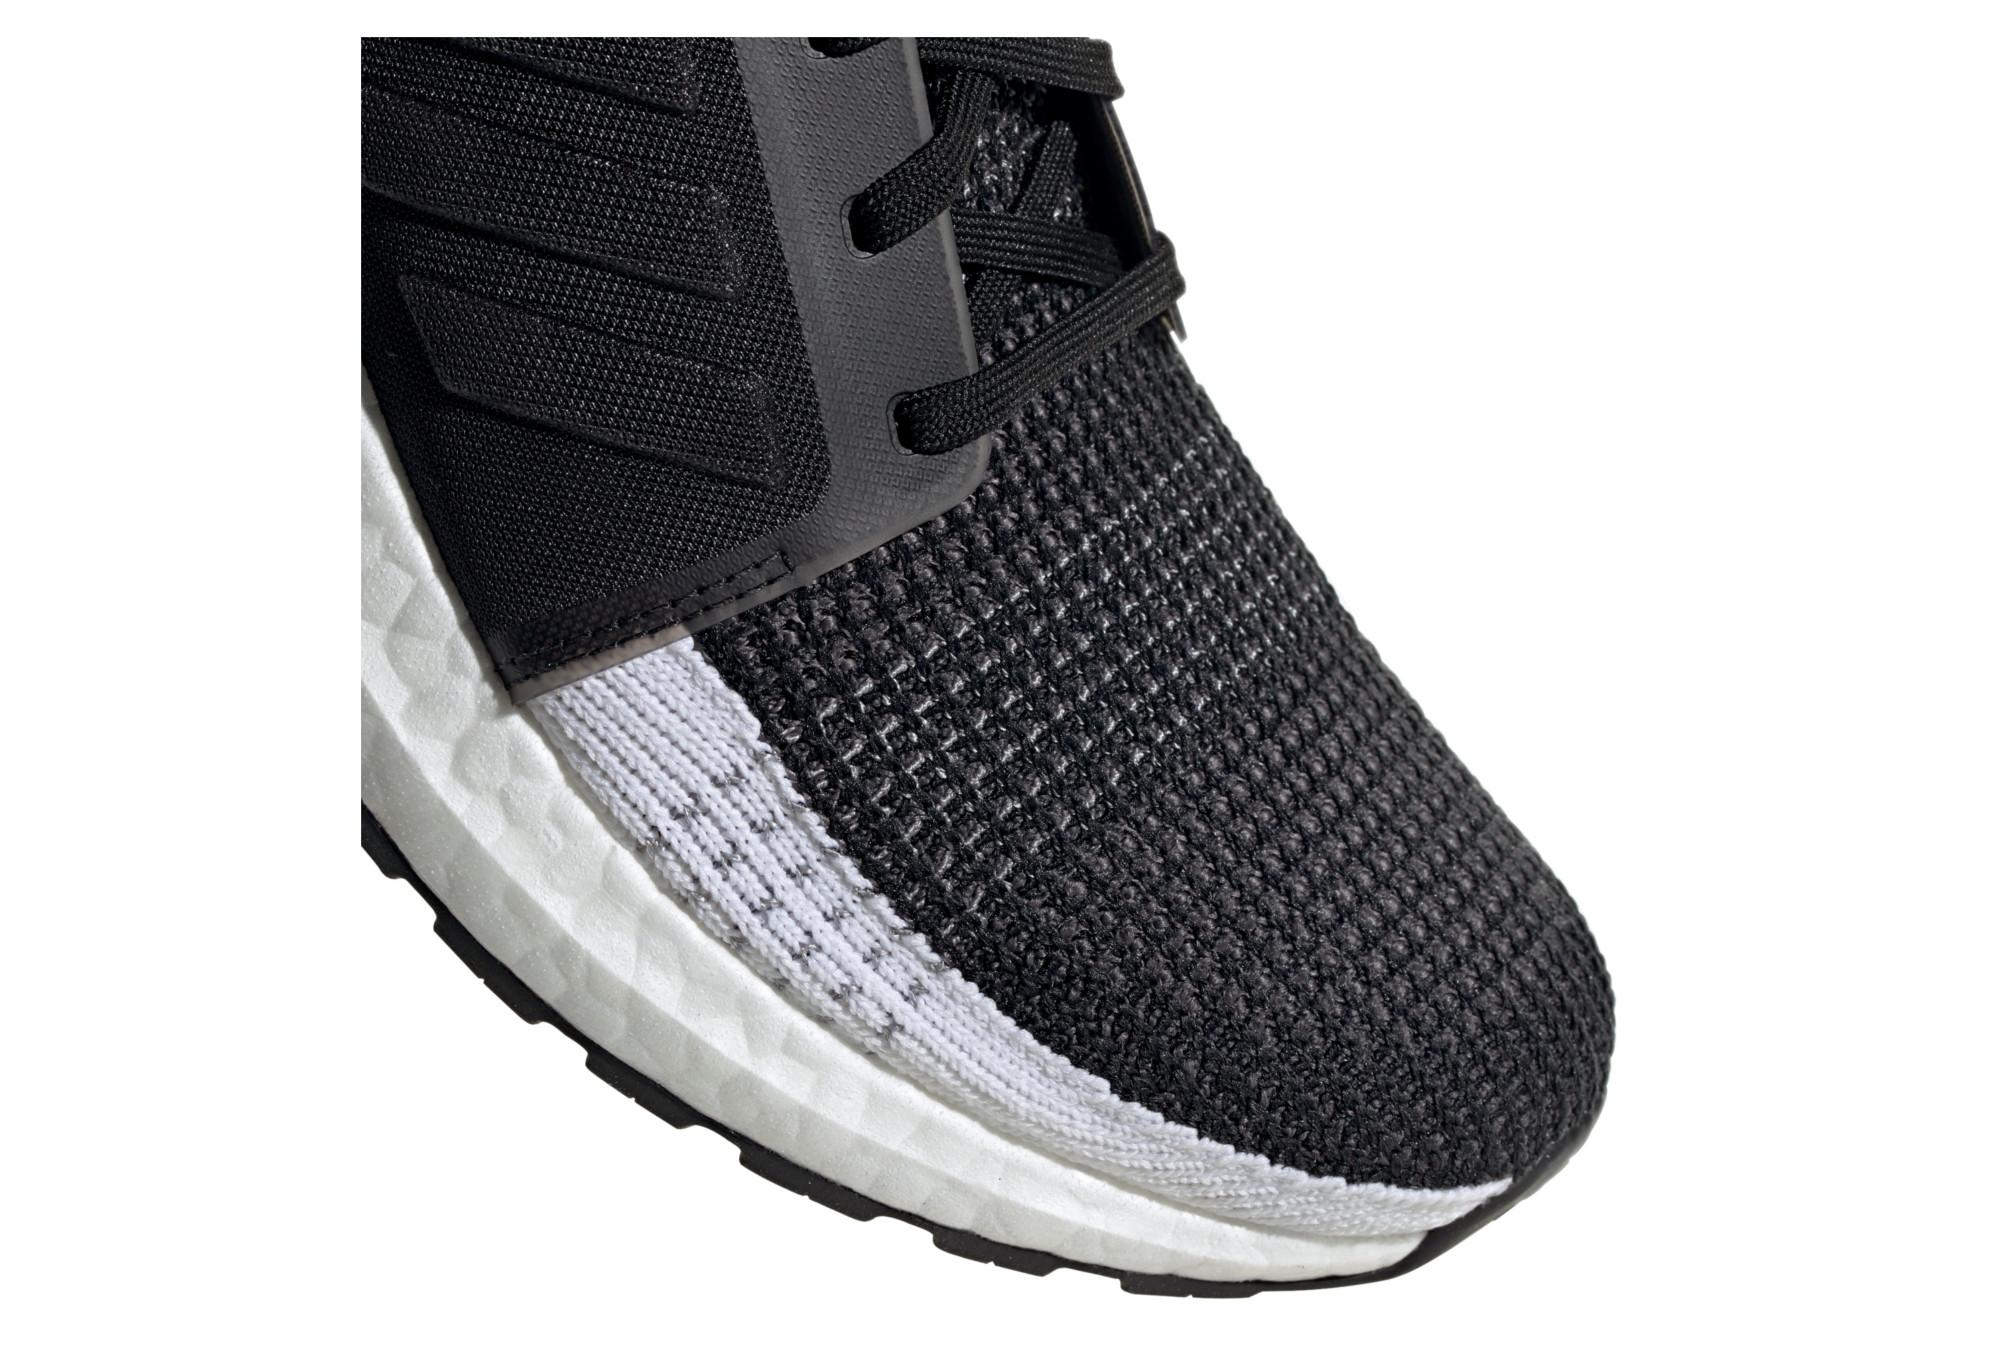 477fedb0a145d Adidas ULTRABOOST 19 Shoes Oreo Black White